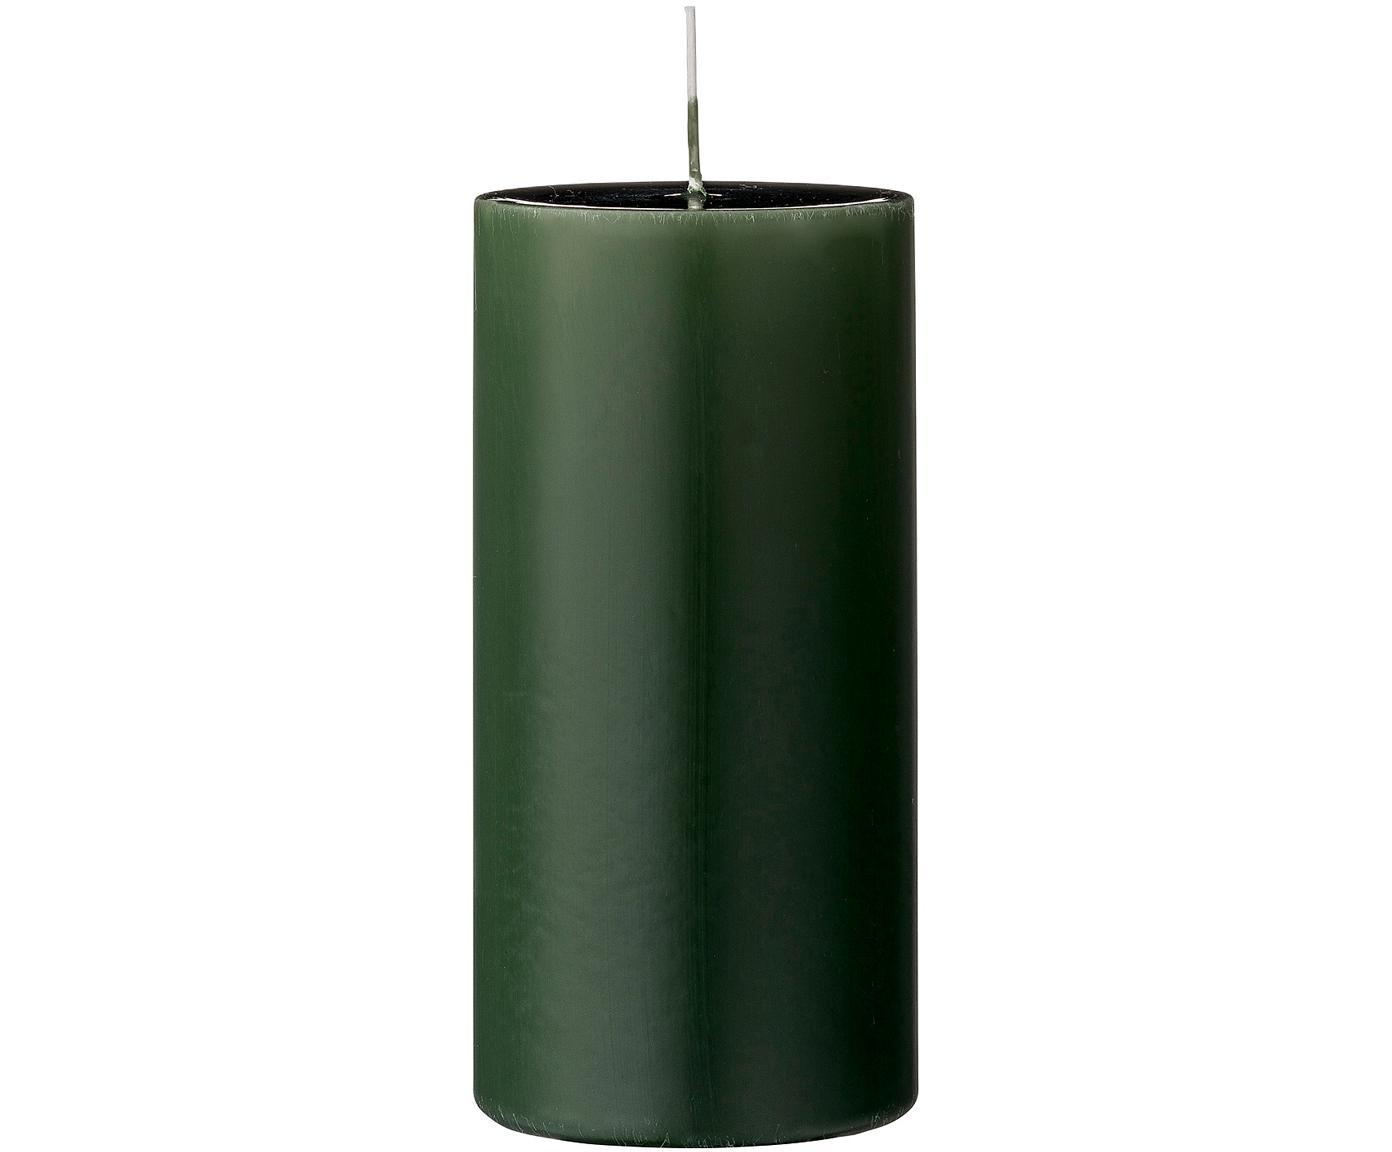 Vilas pilar Lulu, 2 uds., Cera, Verde profundo, Ø 7 x Al 15 cm